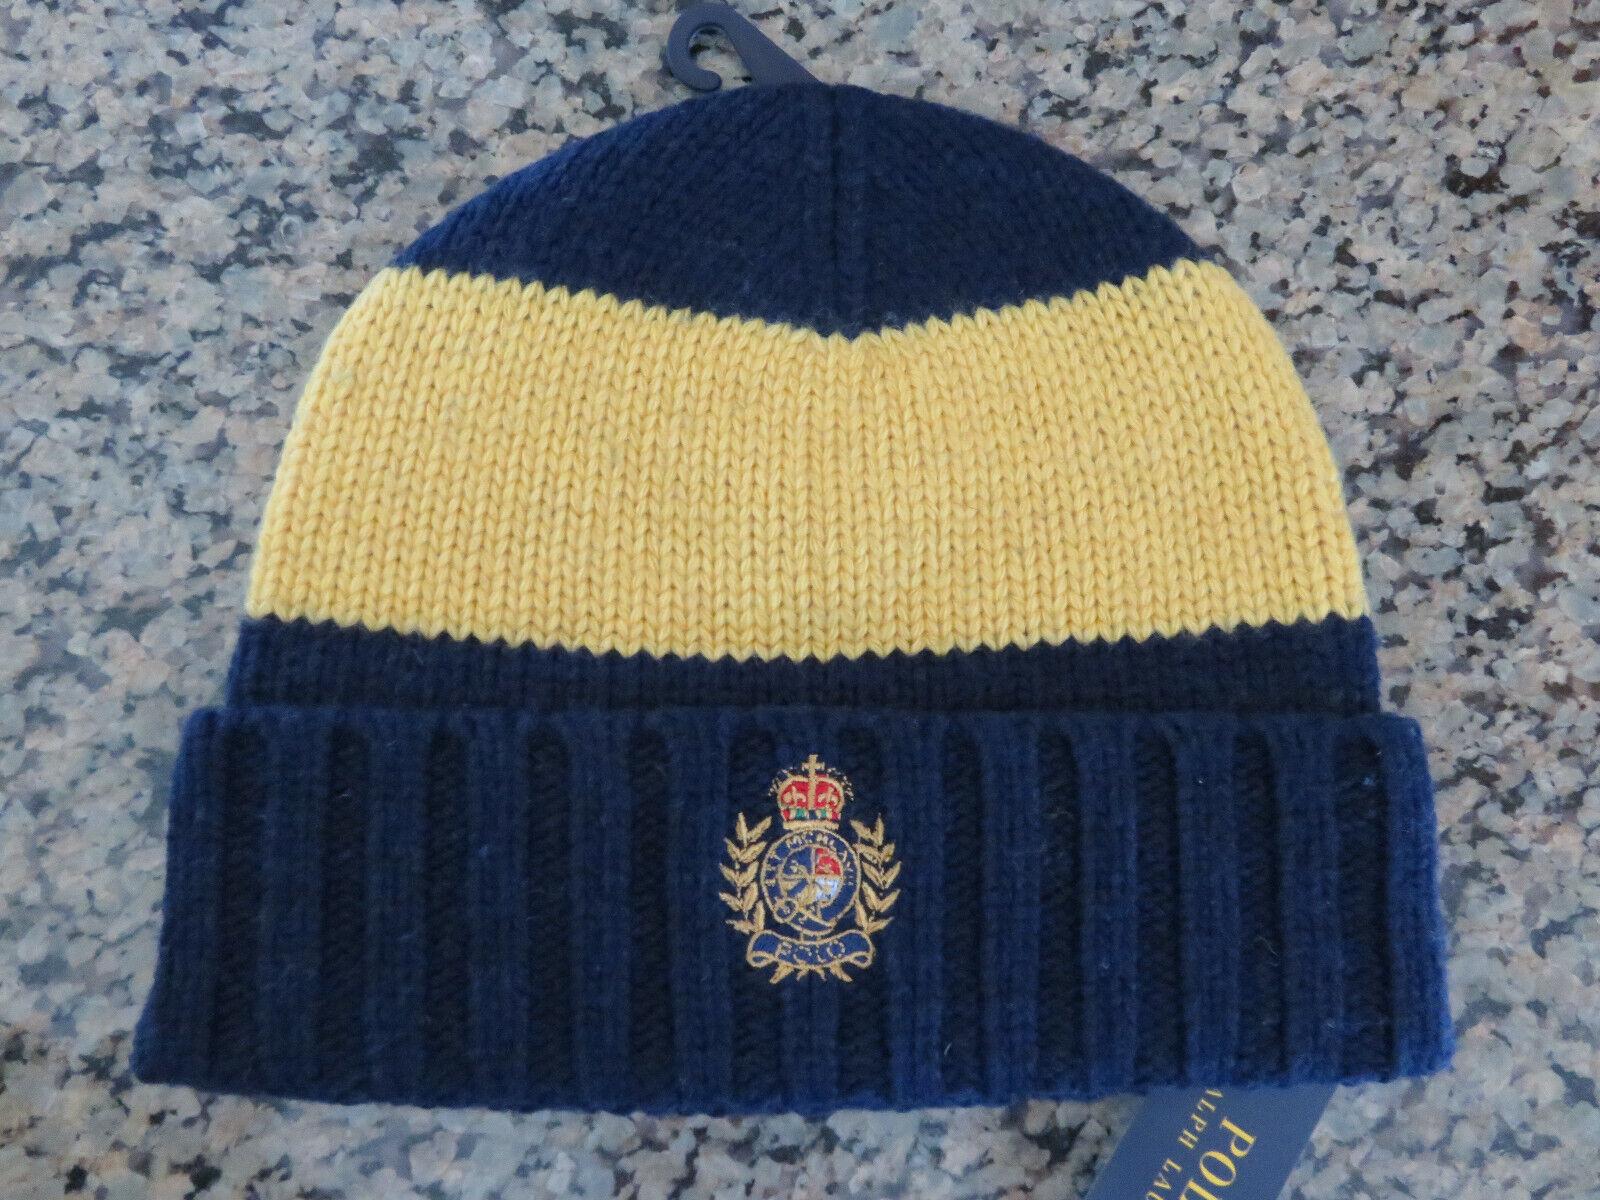 Polo RALPH LAUREN Beanie Skully Hat Cap Polo Crest Wool Blend Knit